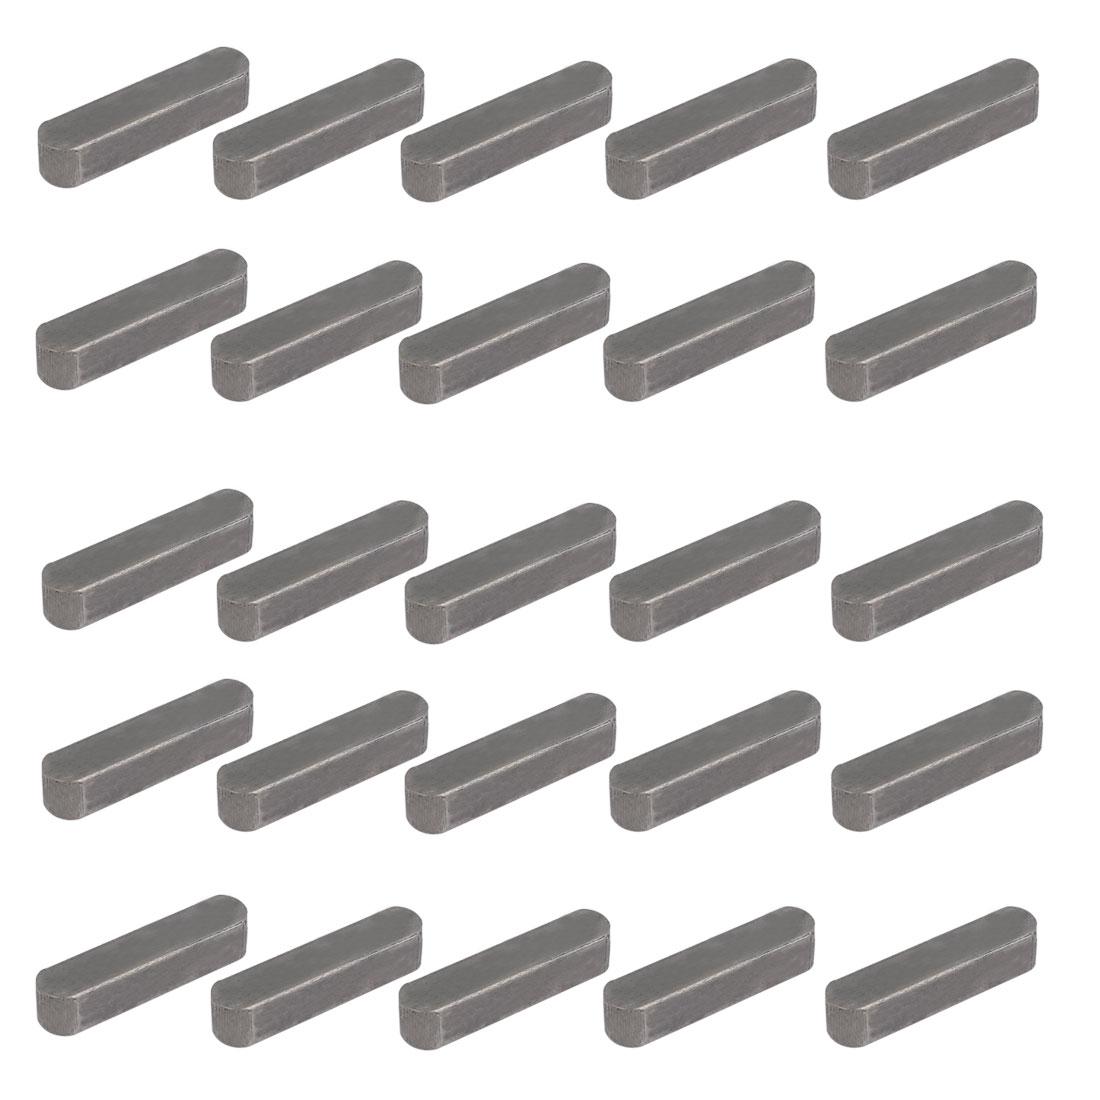 35mmx8mmx7mm Carbon Steel Key Stock To Lock Pulleys 25pcs